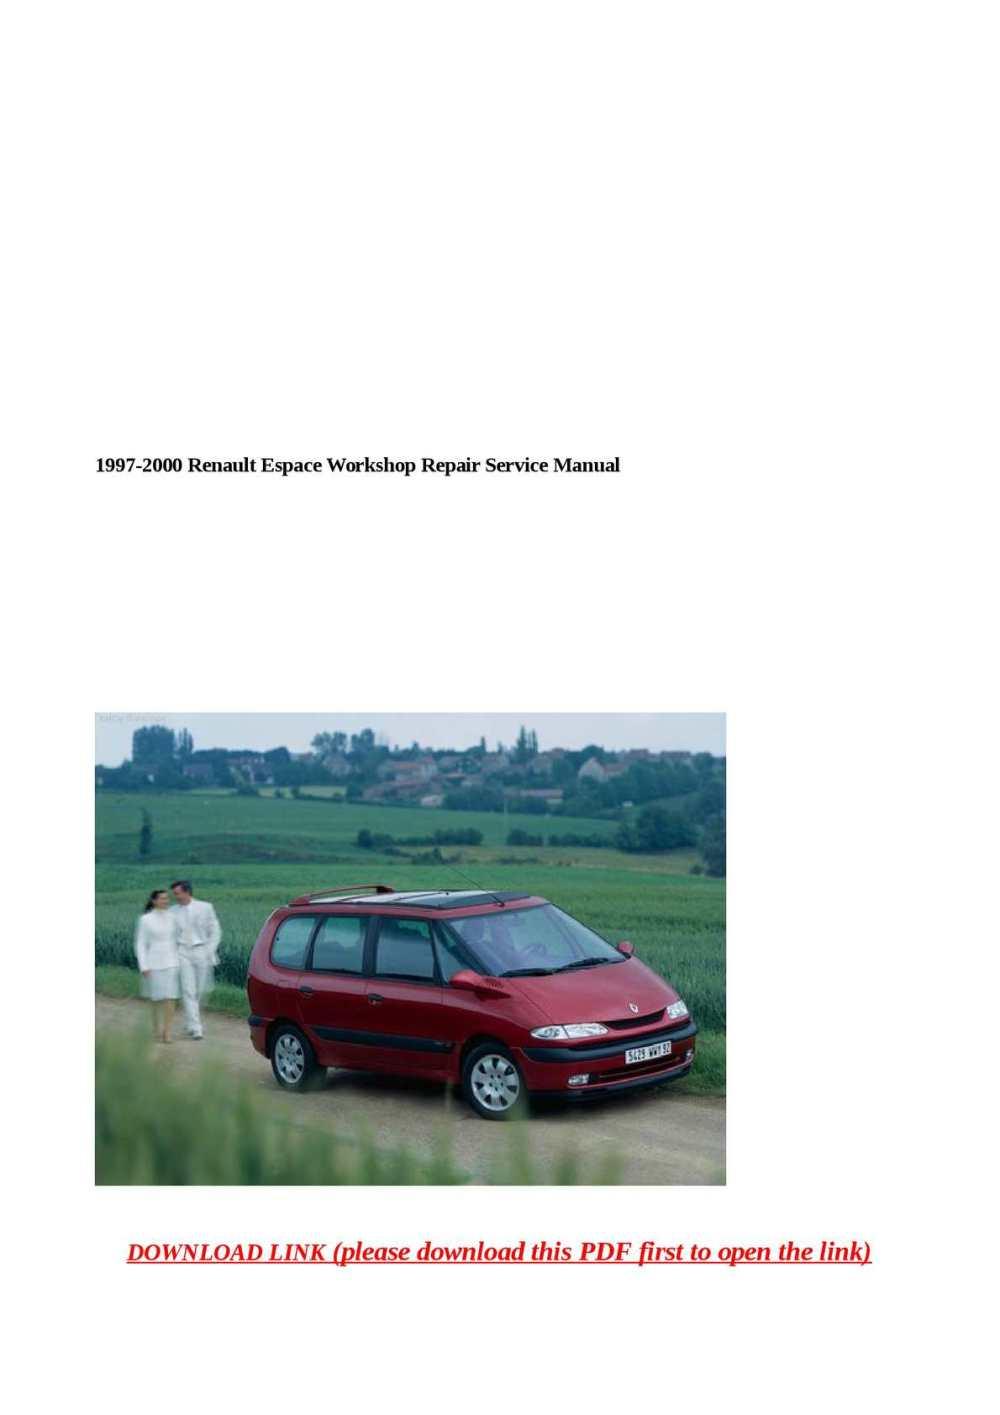 medium resolution of 1997 2000 renault espace workshop repair service manual